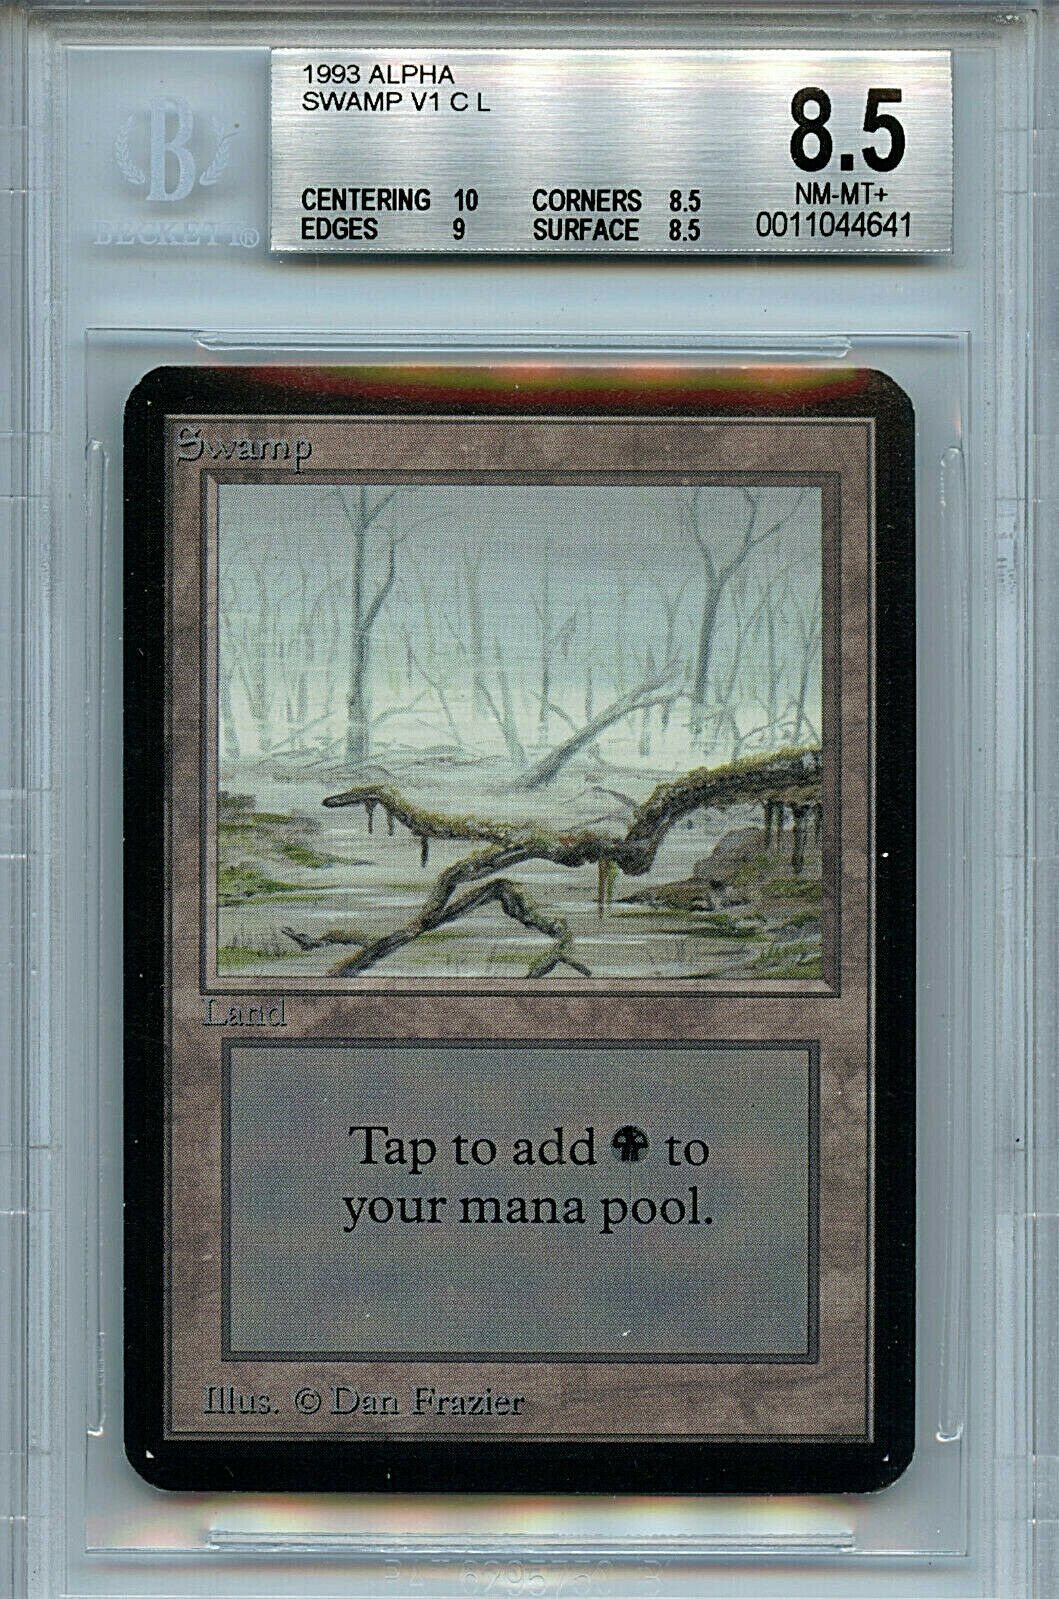 MTG Alpha Swamp V2 A BGS 8.5 NM MT+ Magic Land Card 10 Centering 4641